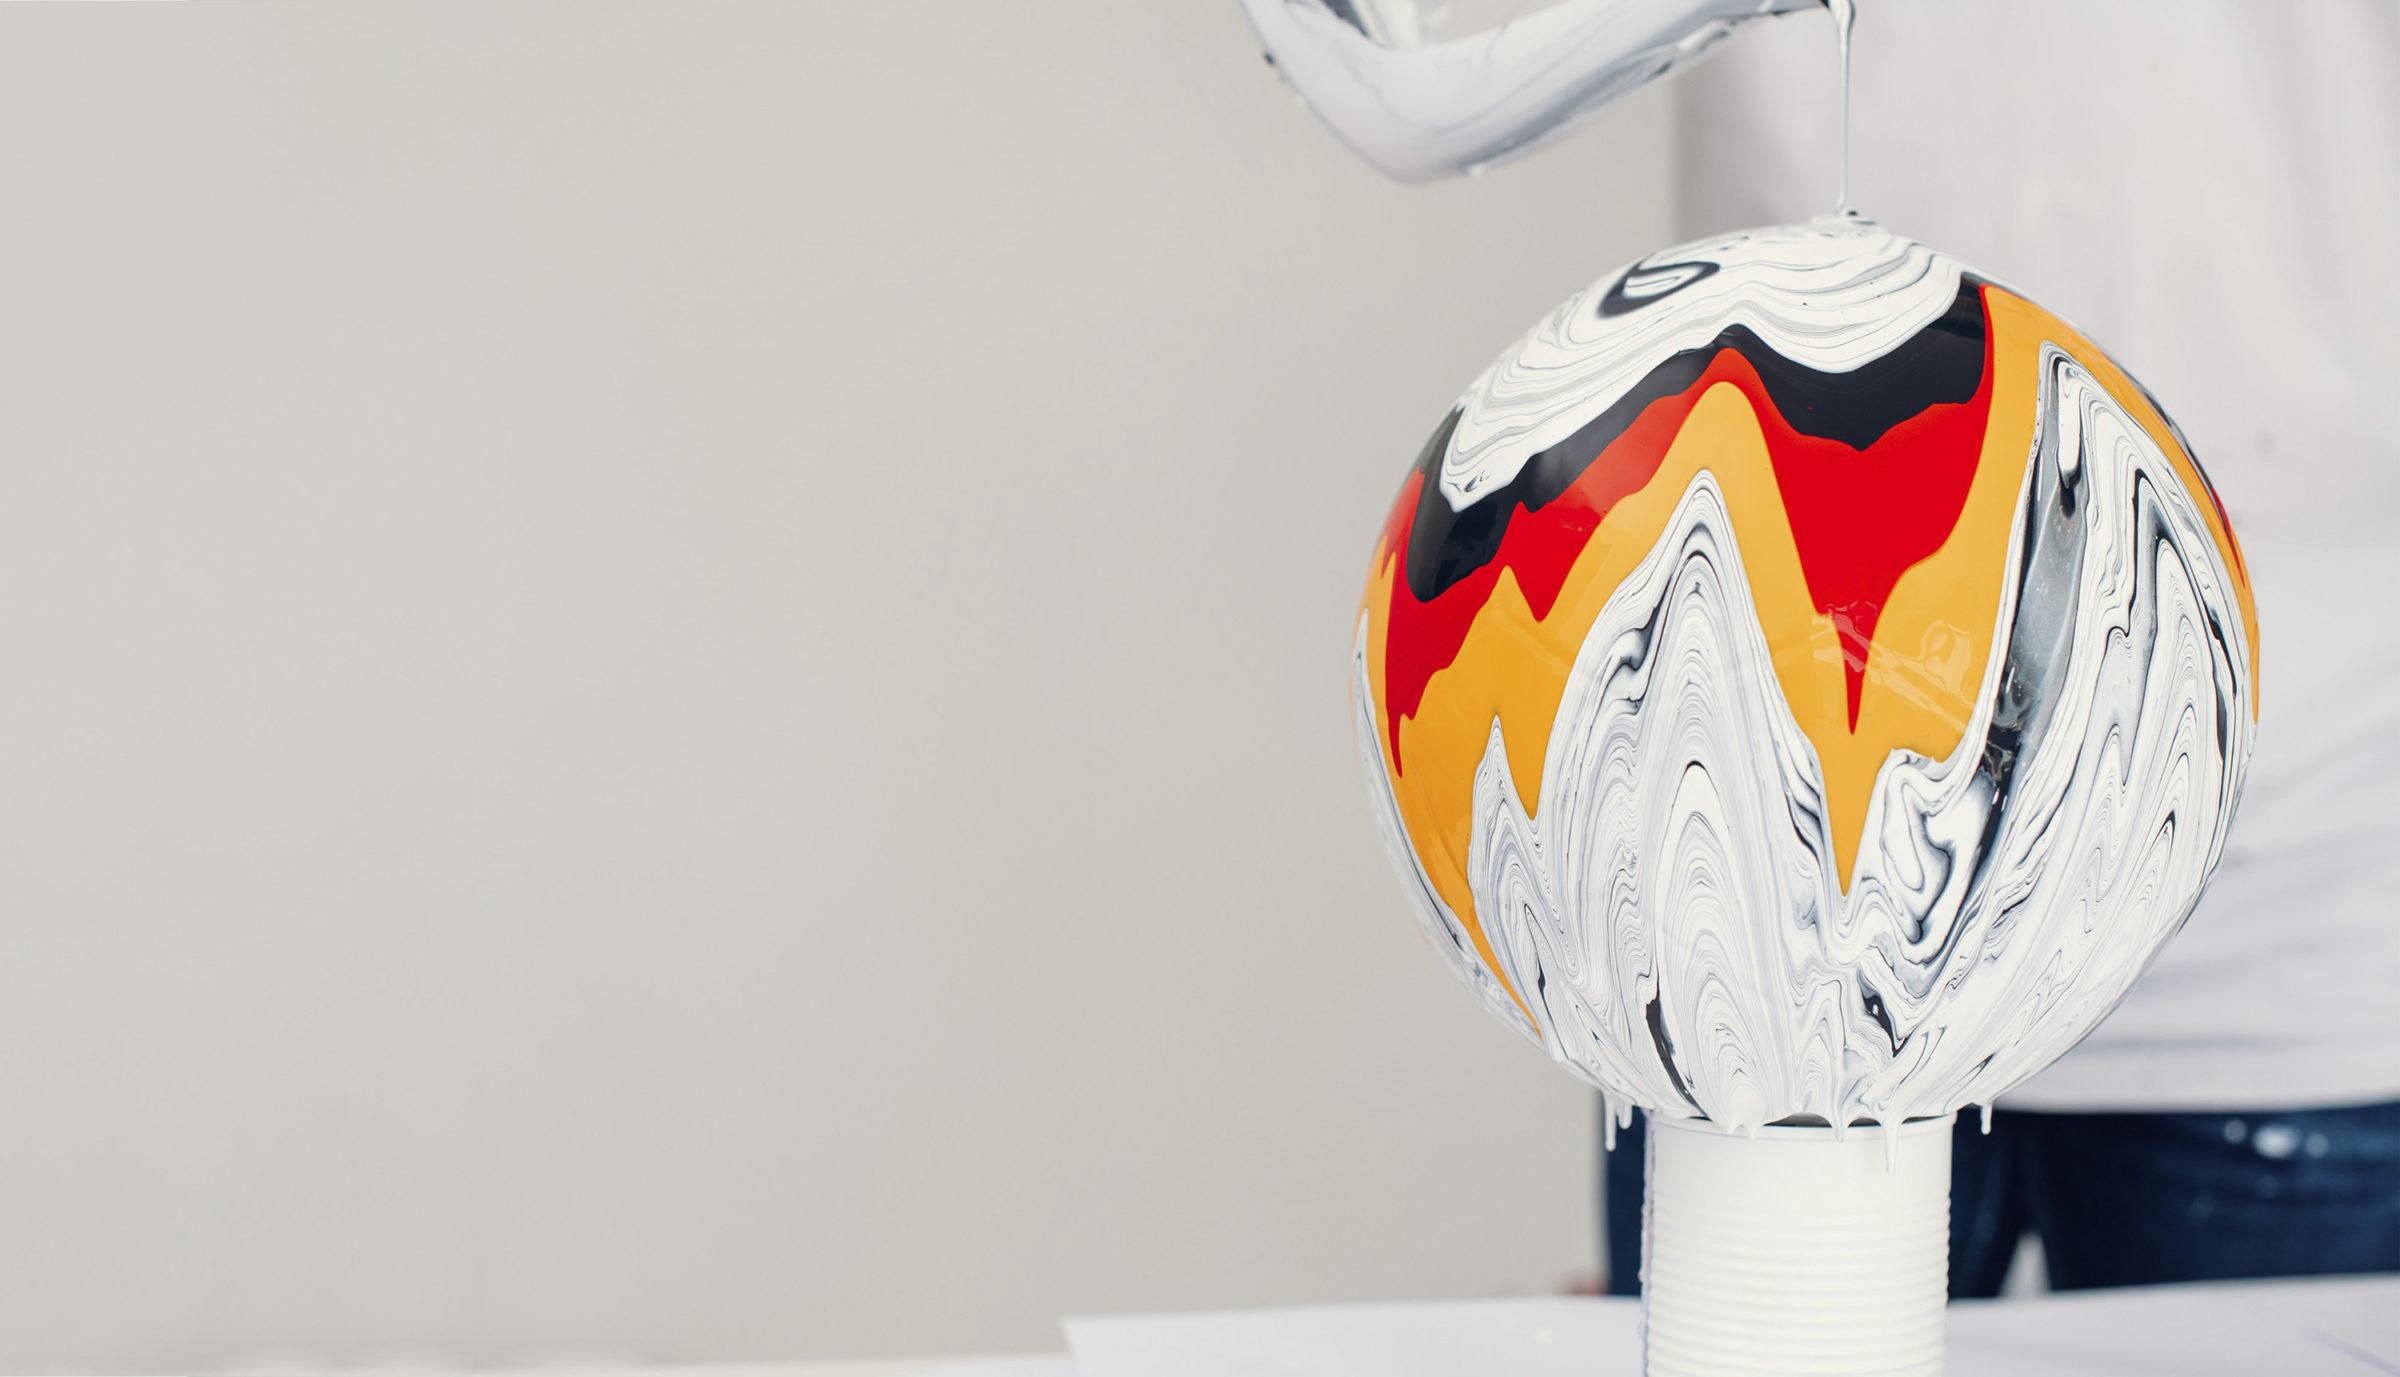 Craig Black x The Fusion Series Footballs Acrylic Fusion Football Art Installation 11 Germany